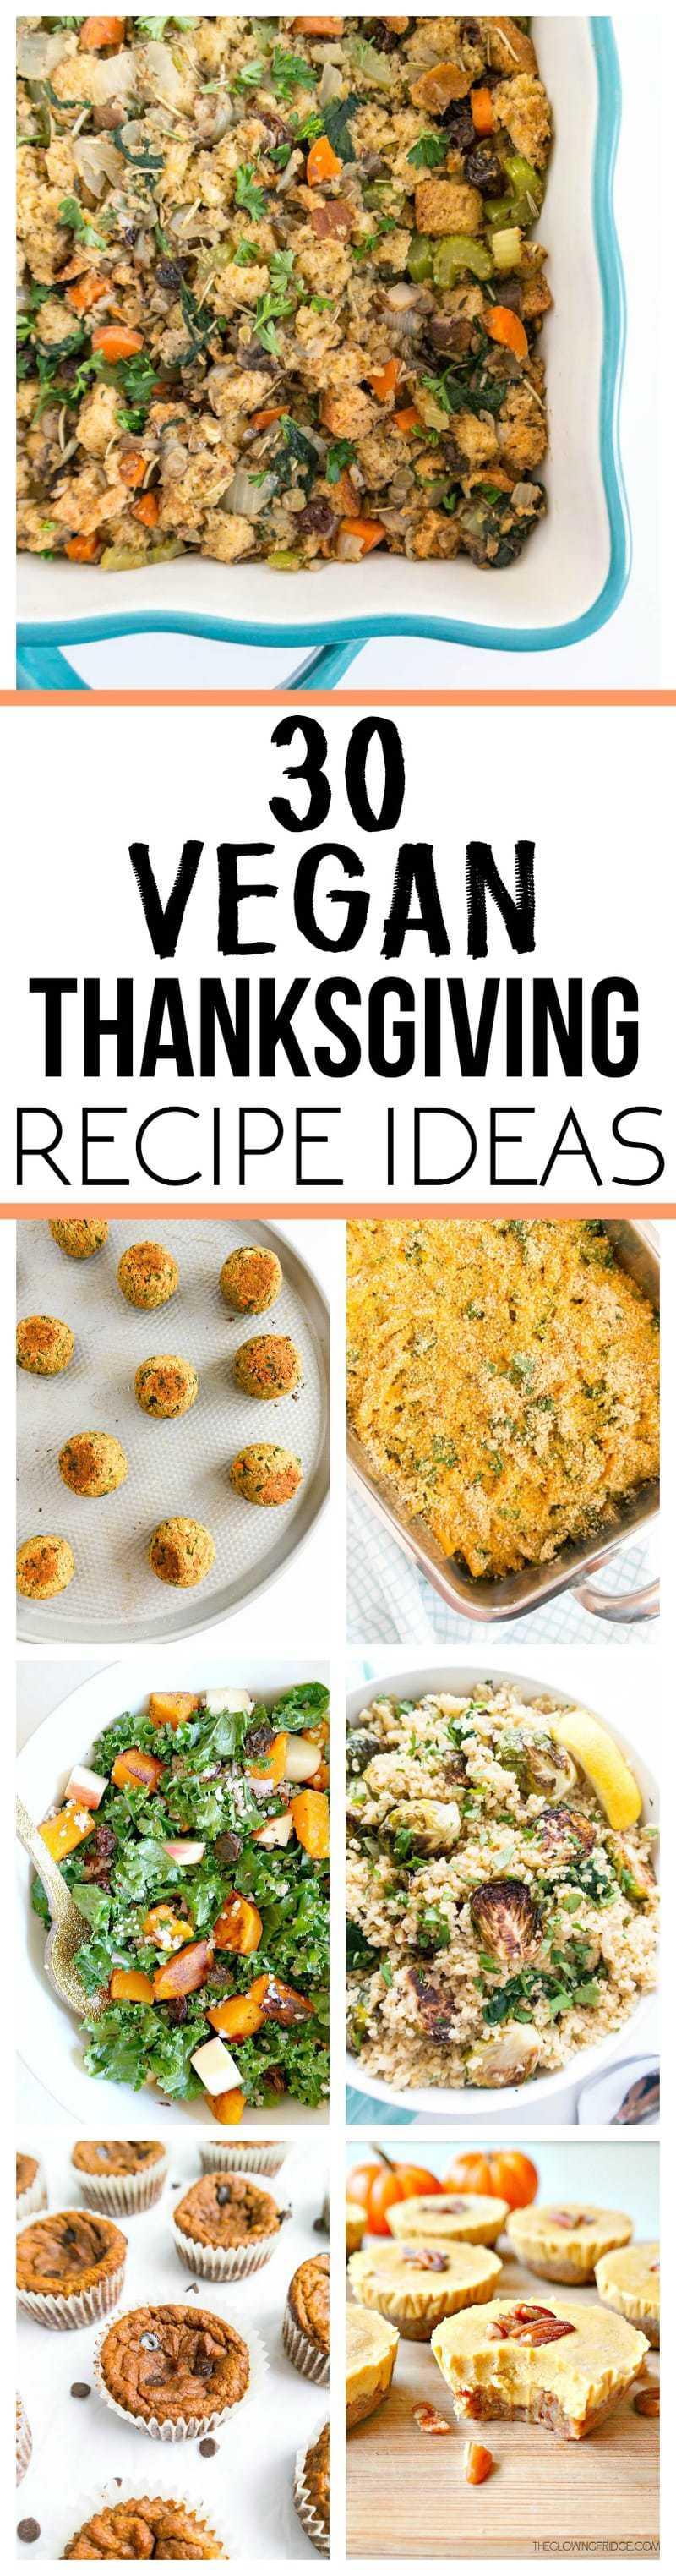 30 Vegan Thanksgiving Recipe Ideas #veganthanksgiving #vegan #dinner #recipe #thanksgiving